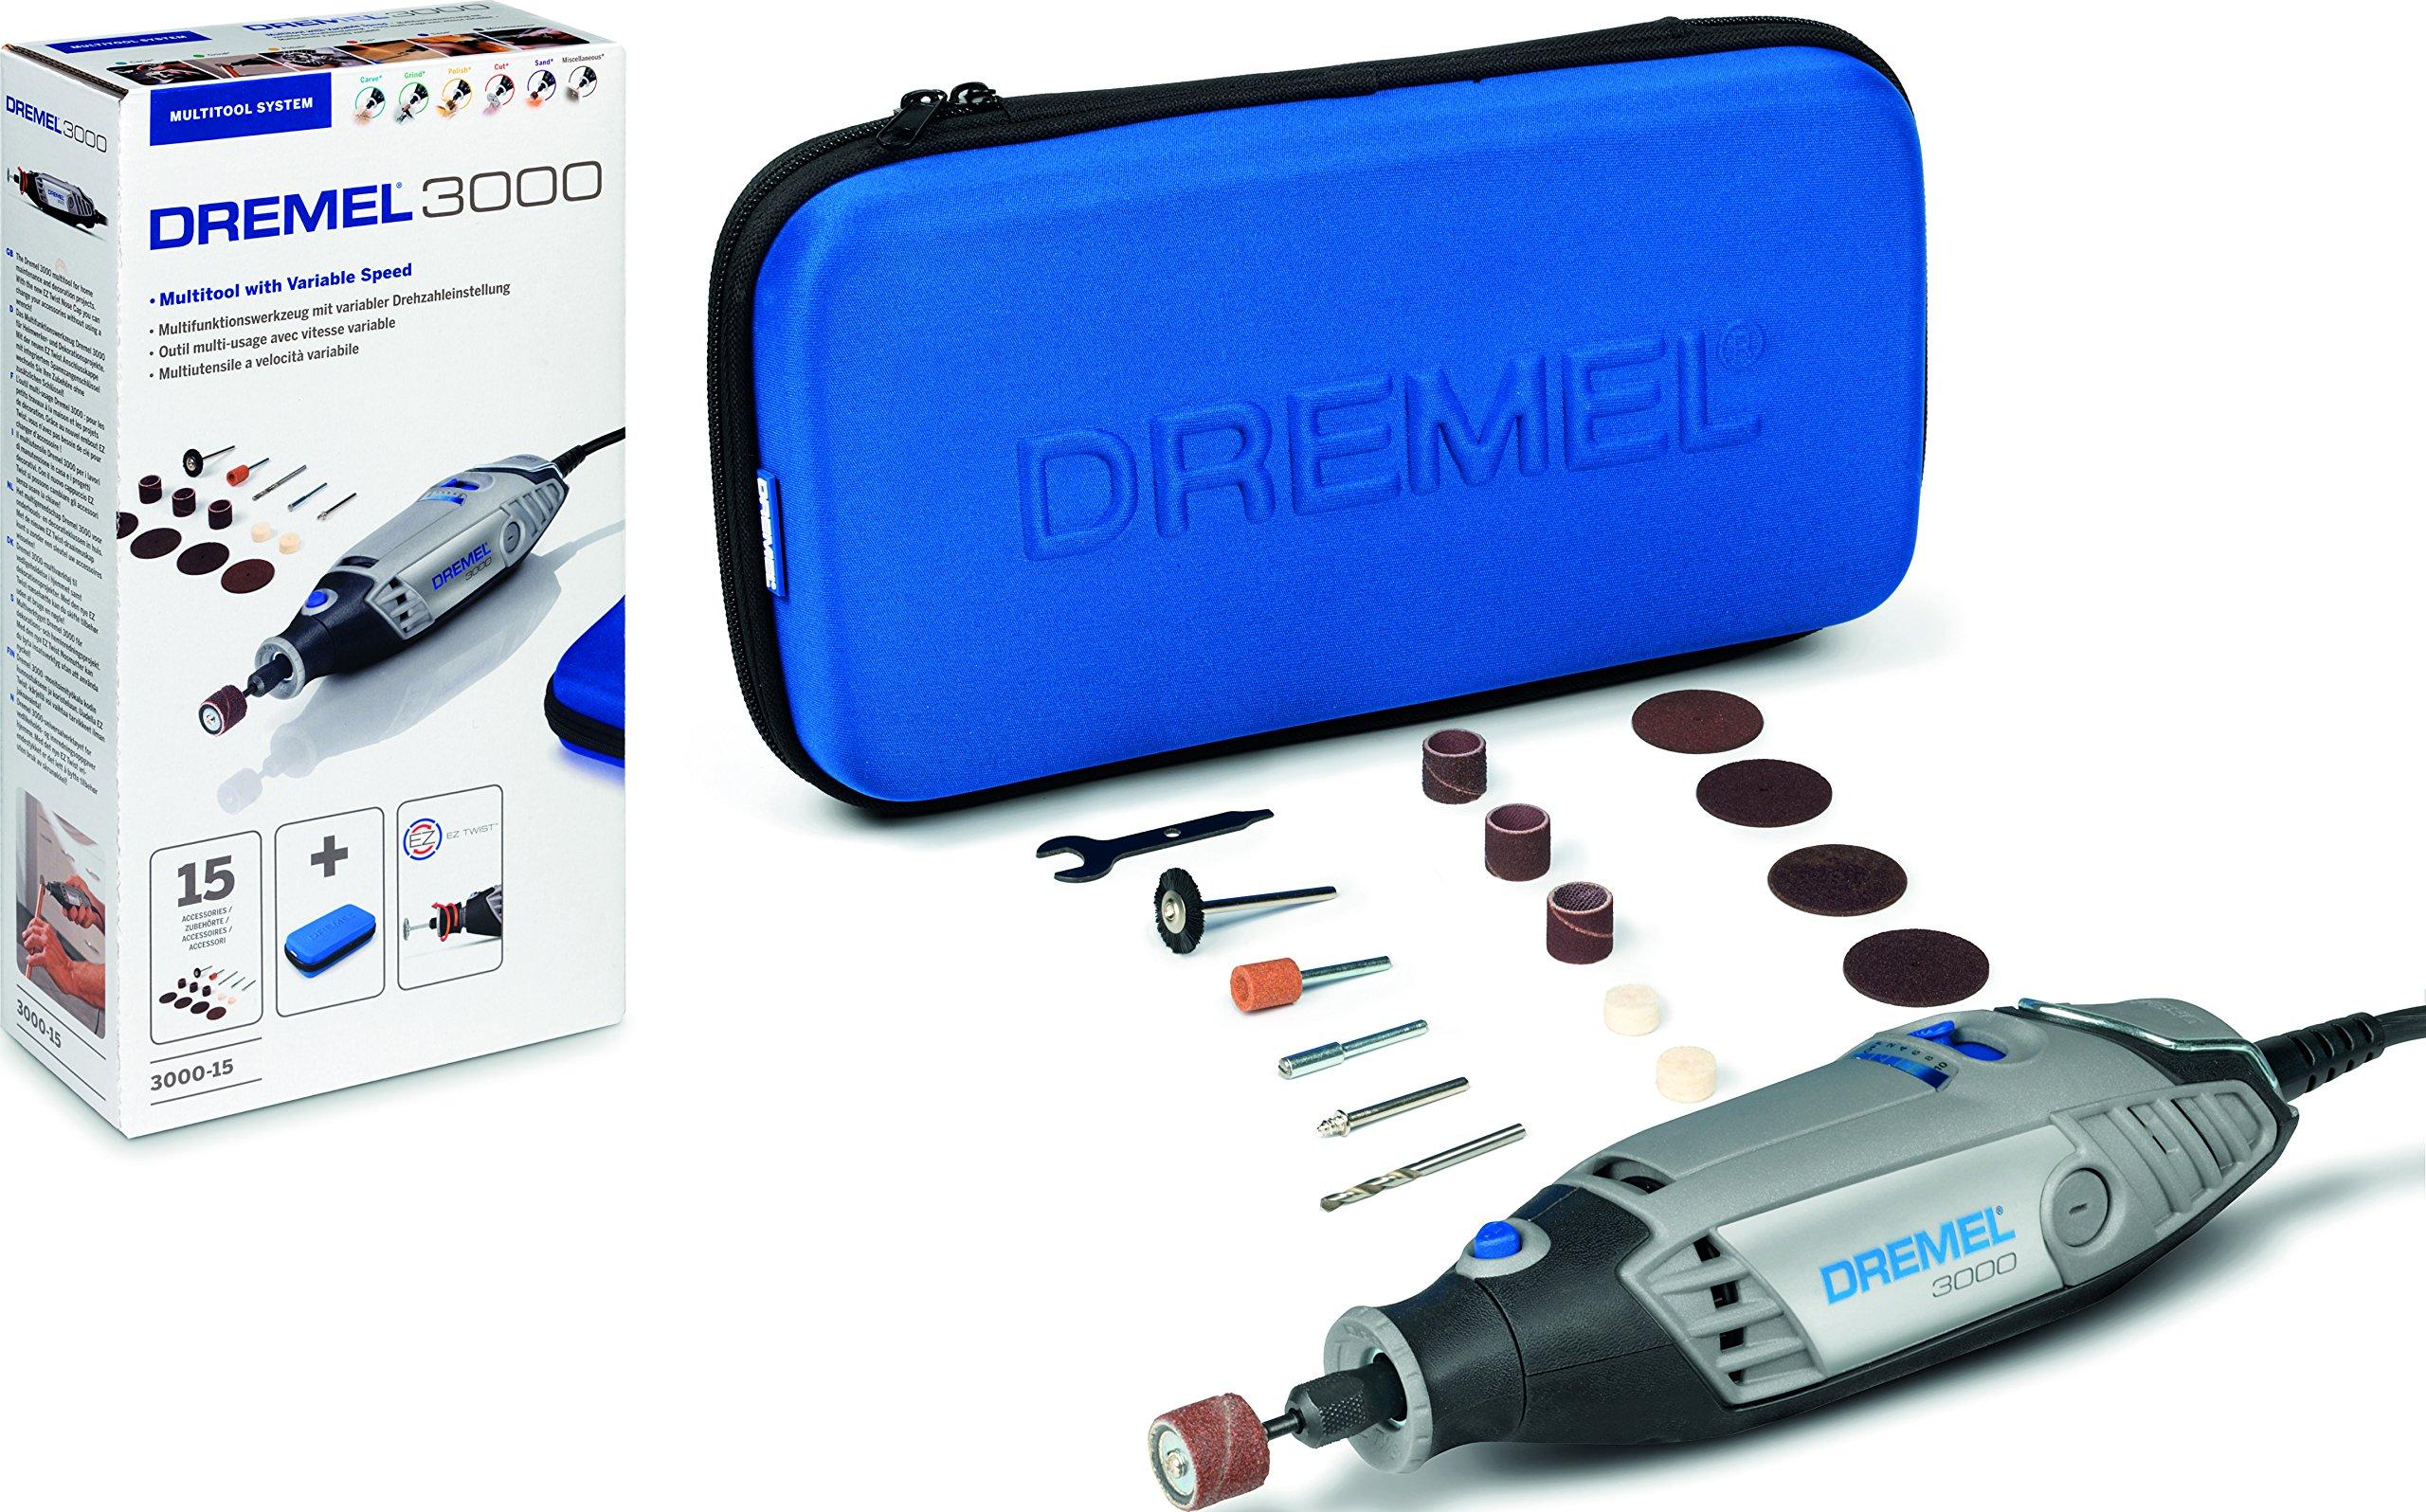 Dremel 3000 - Multiherramienta (130 W, 15 accesorios y estuche) product image